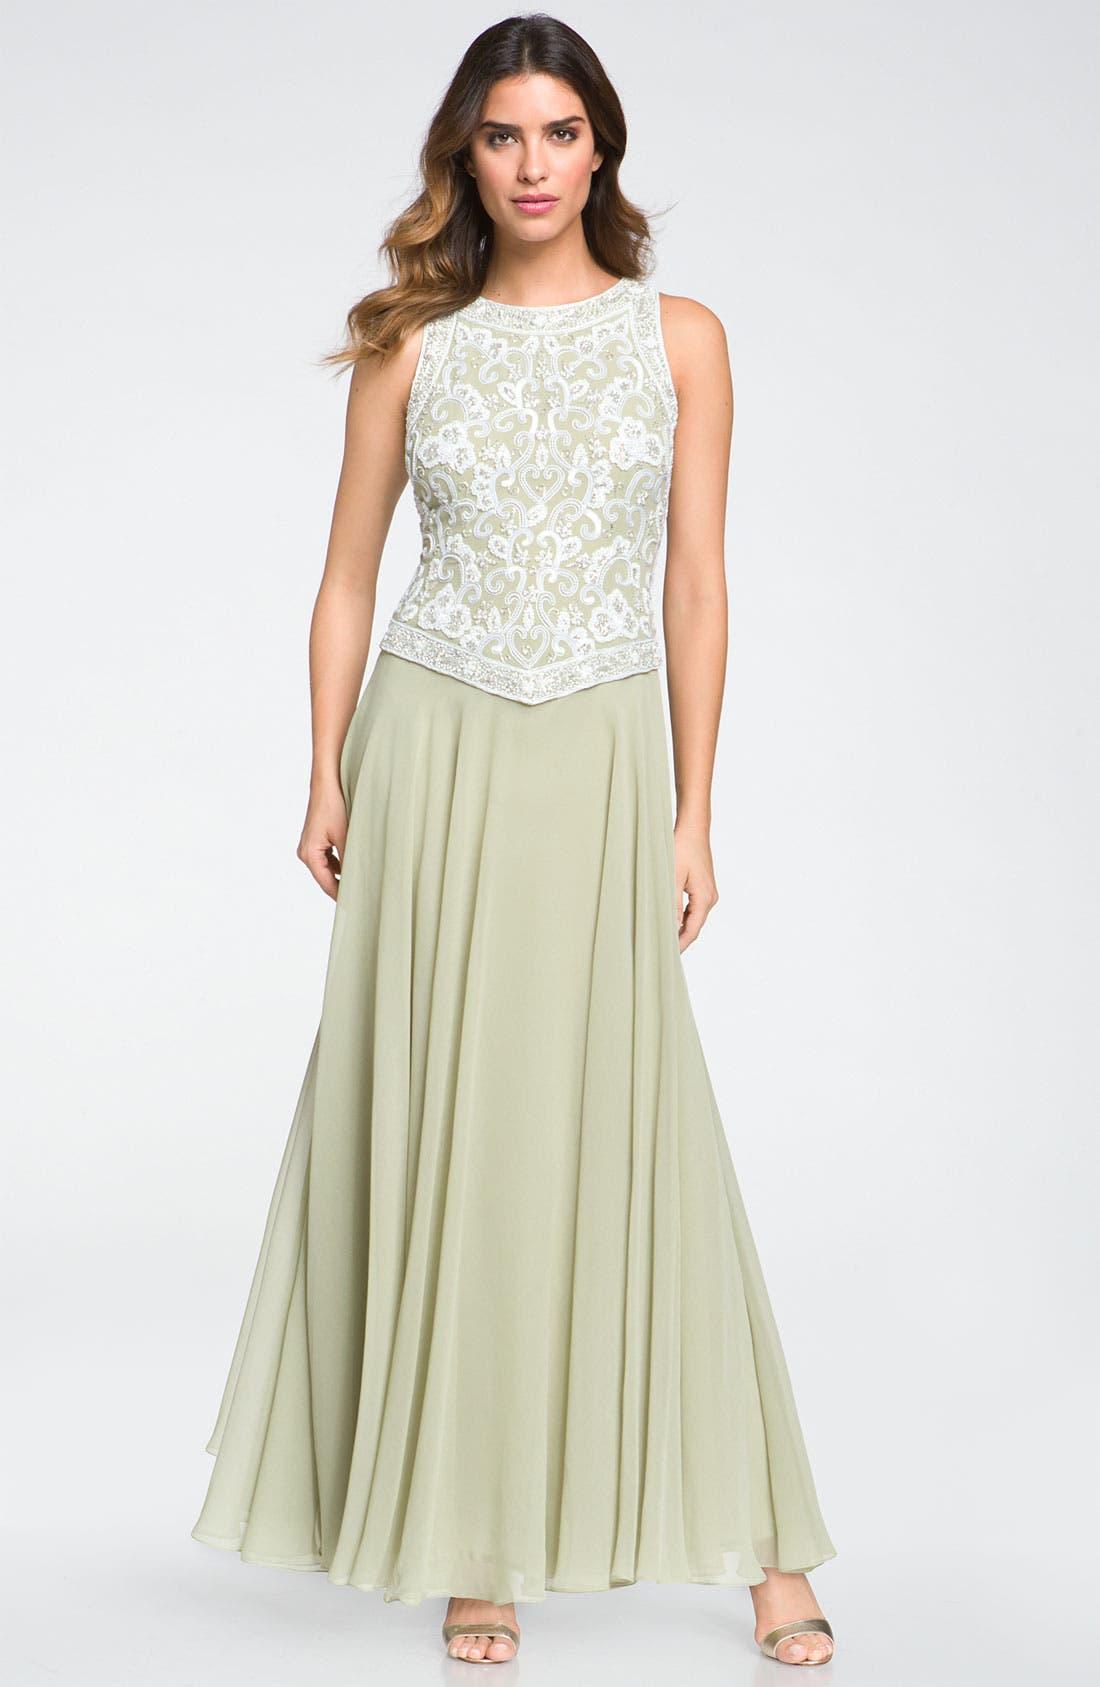 Main Image - J Kara Embellished Sleeveless Crepe Gown (Petite)